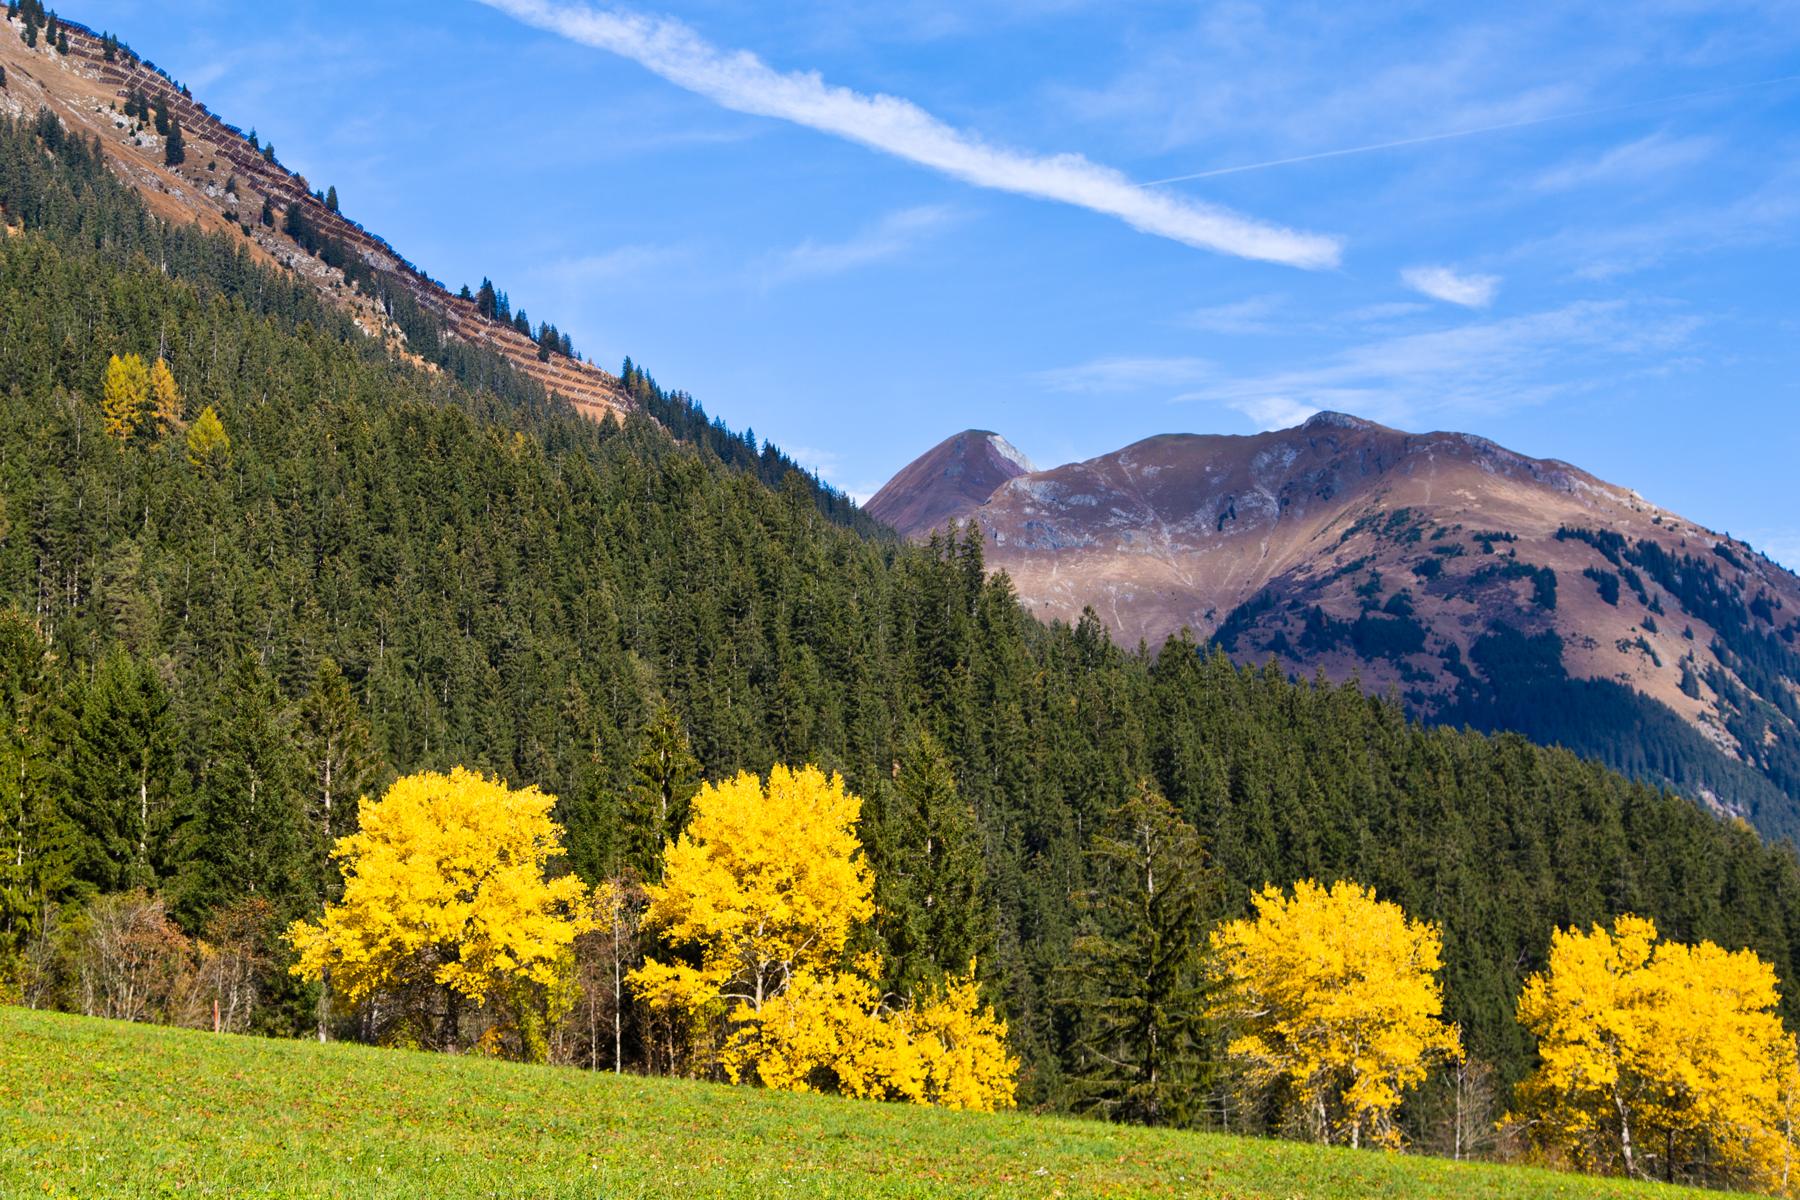 Baumgruppe gelb leuchtend